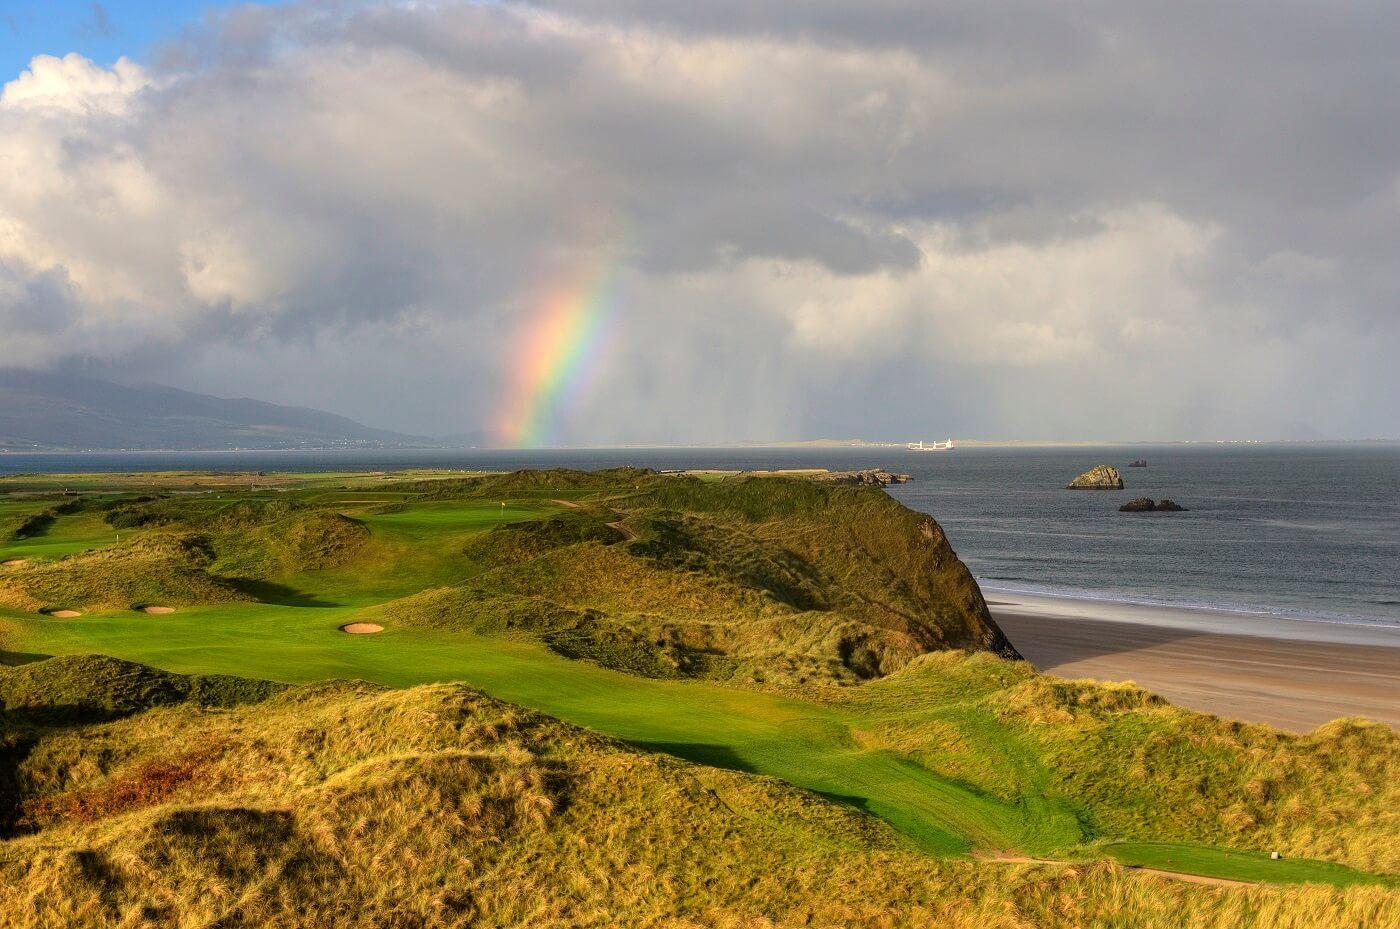 beautiful scenery at Tralee golf